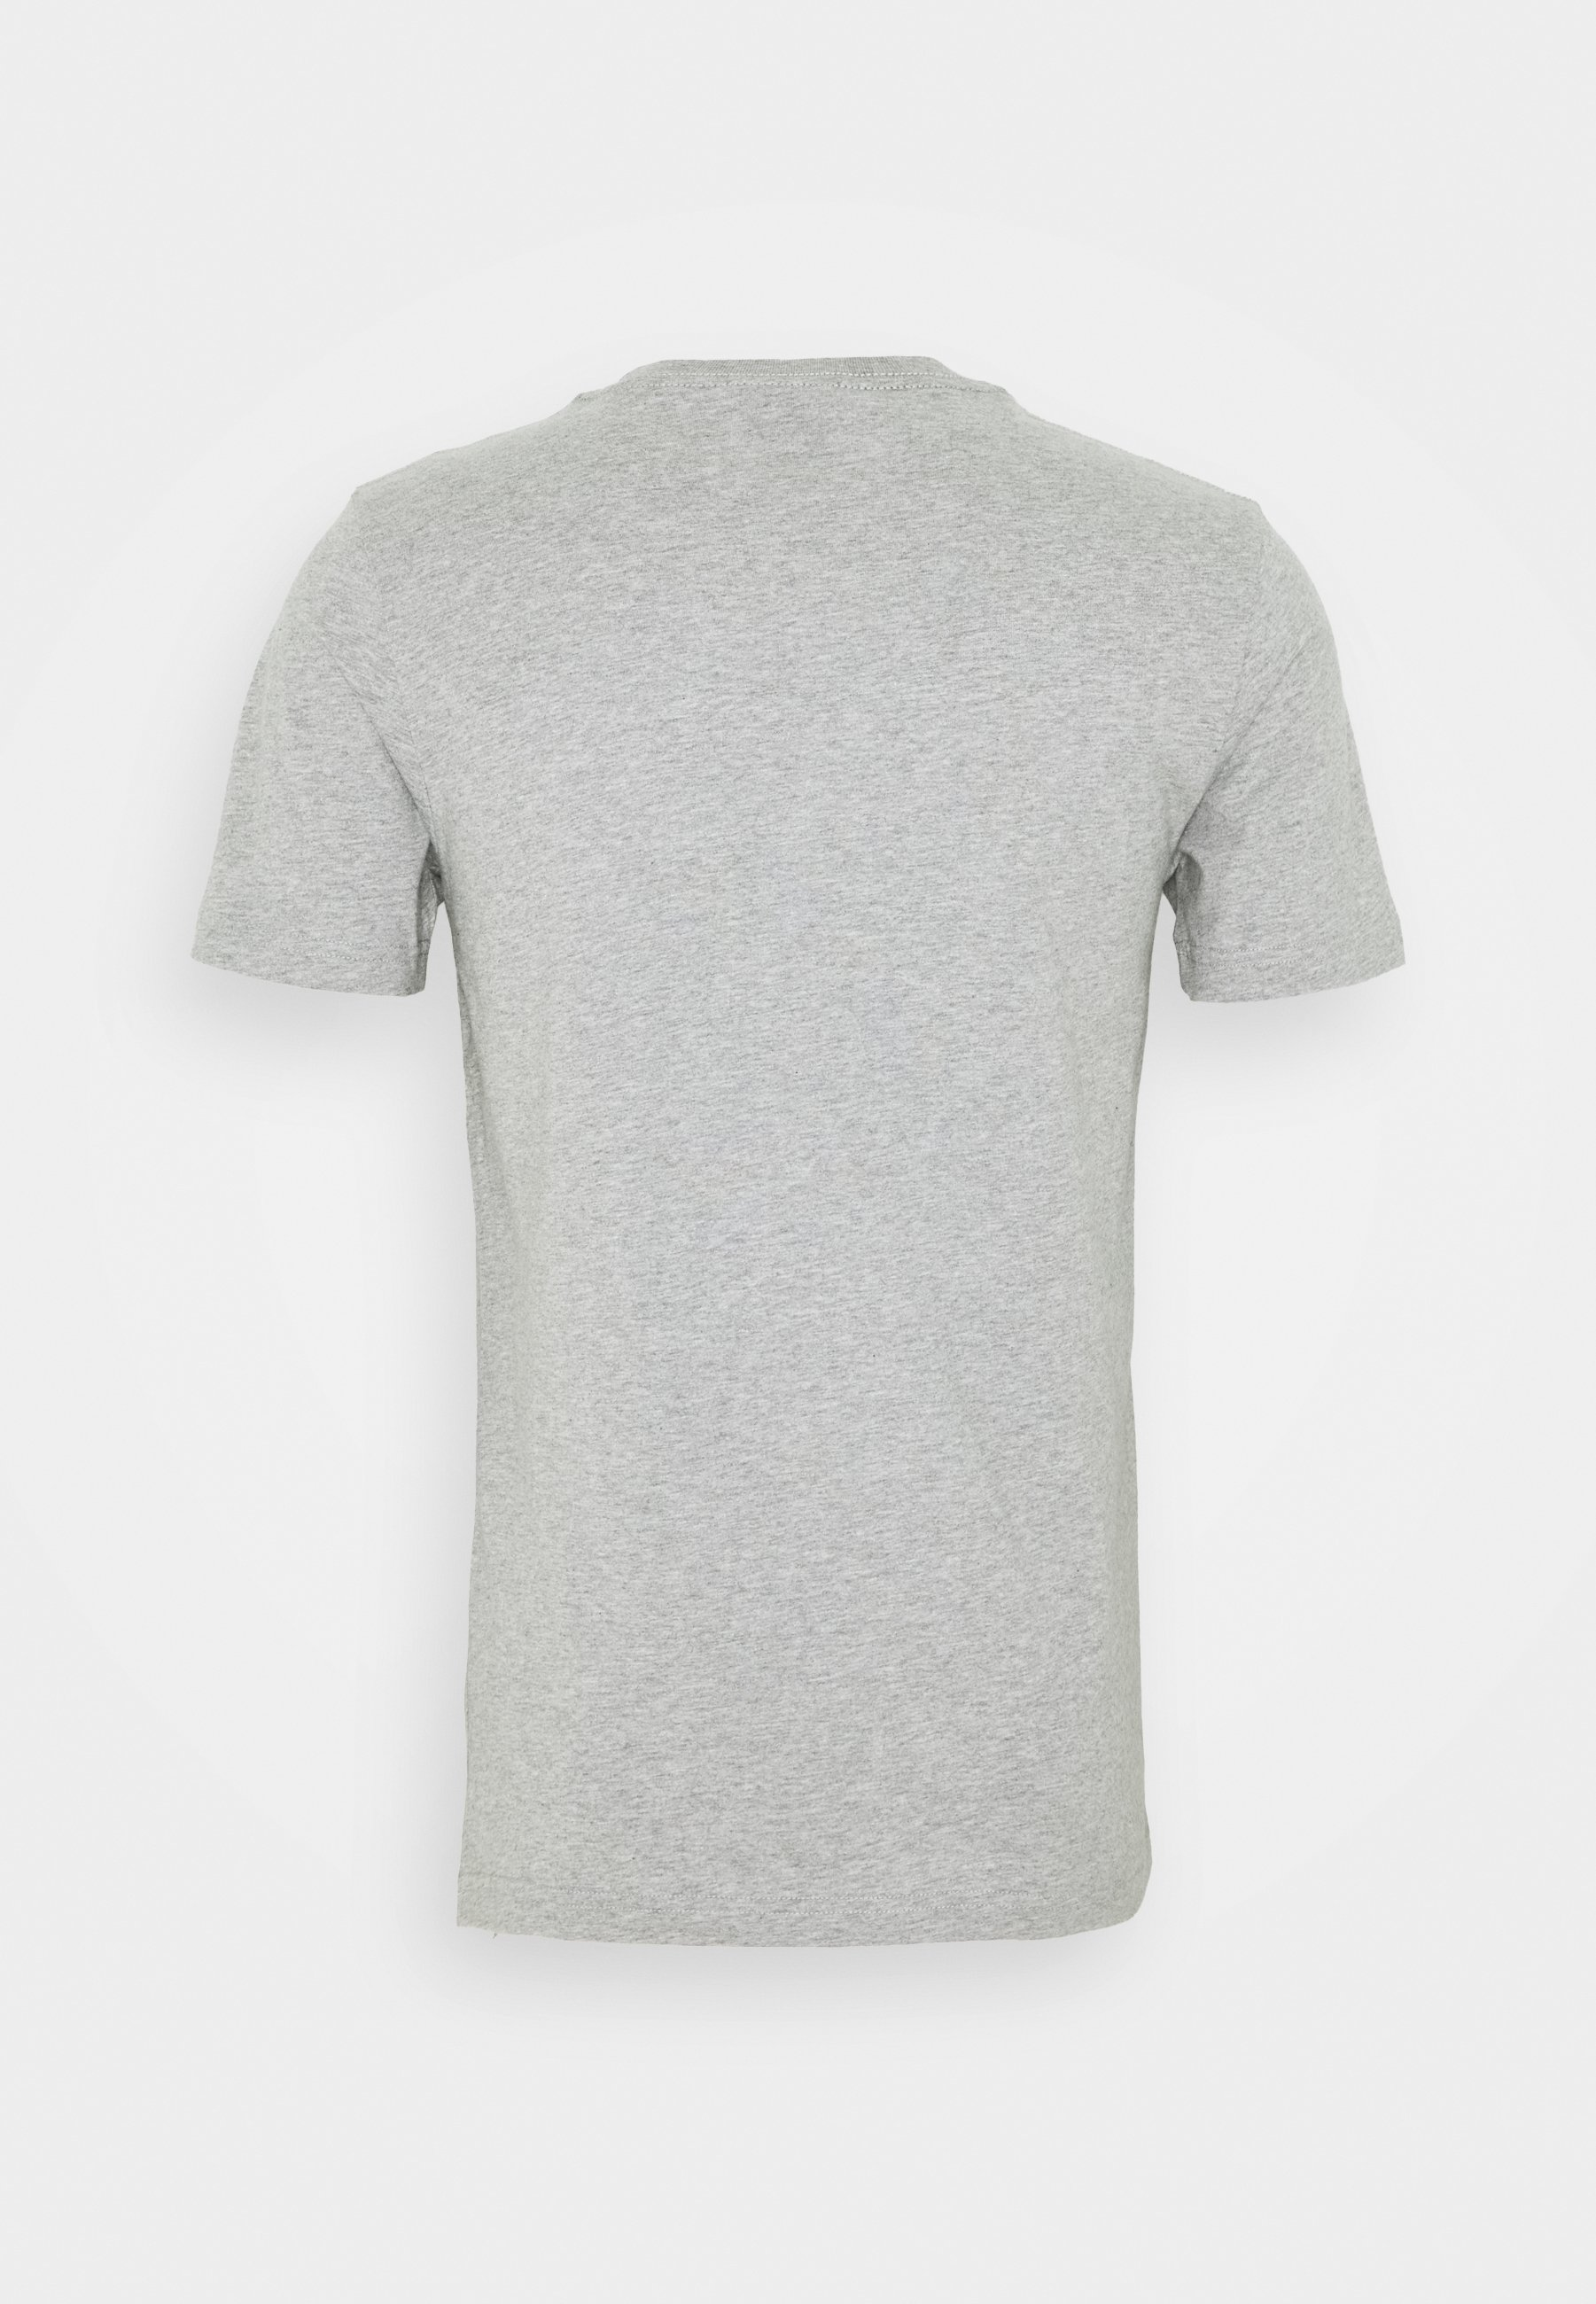 Ps Paul Smith Slim Fit Bolt Juju - T-shirt Con Stampa Mottled Grey k78Ut